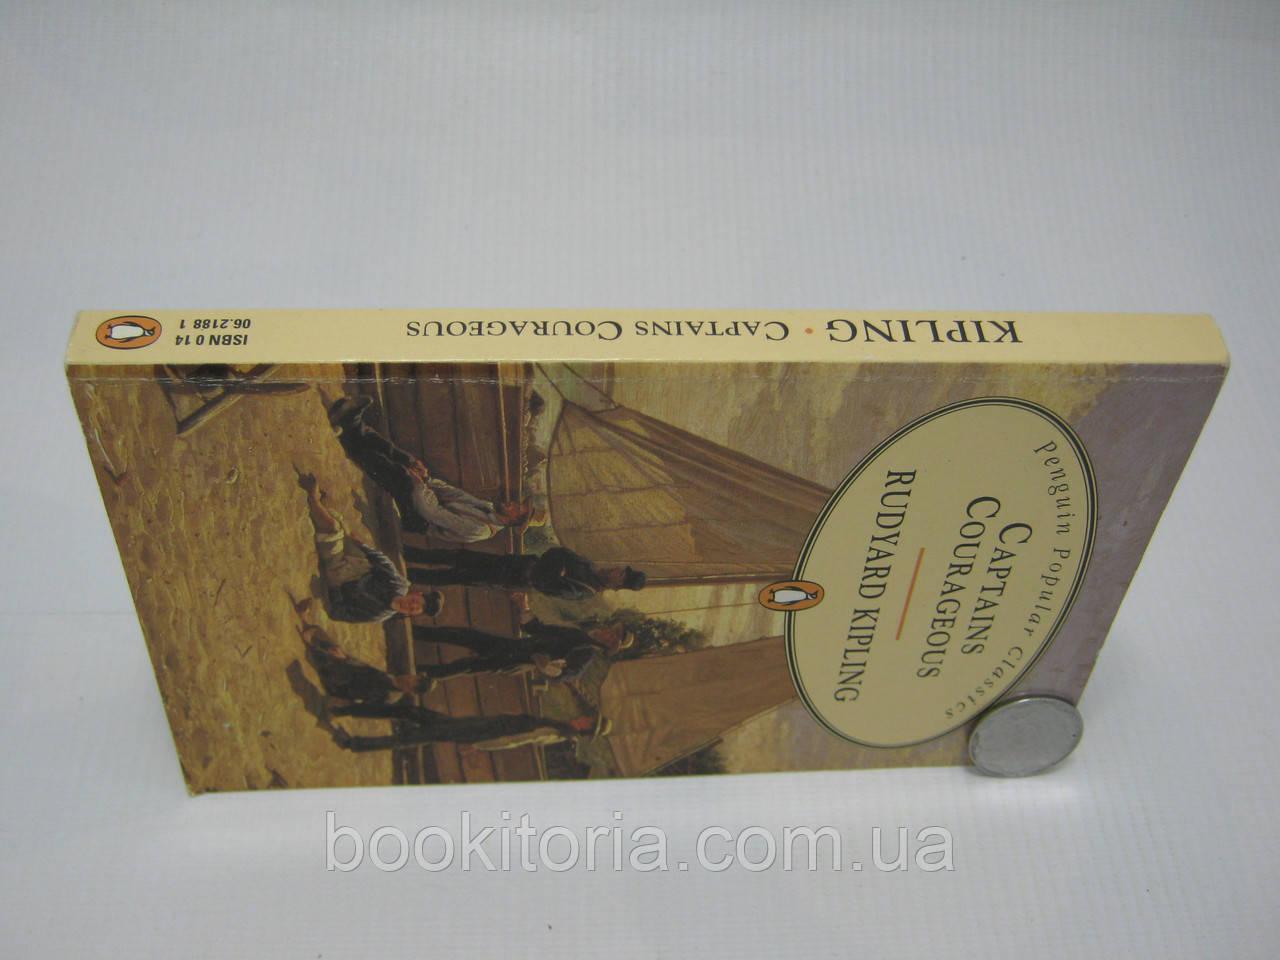 Kipling R. Captains Courageous (б/у).